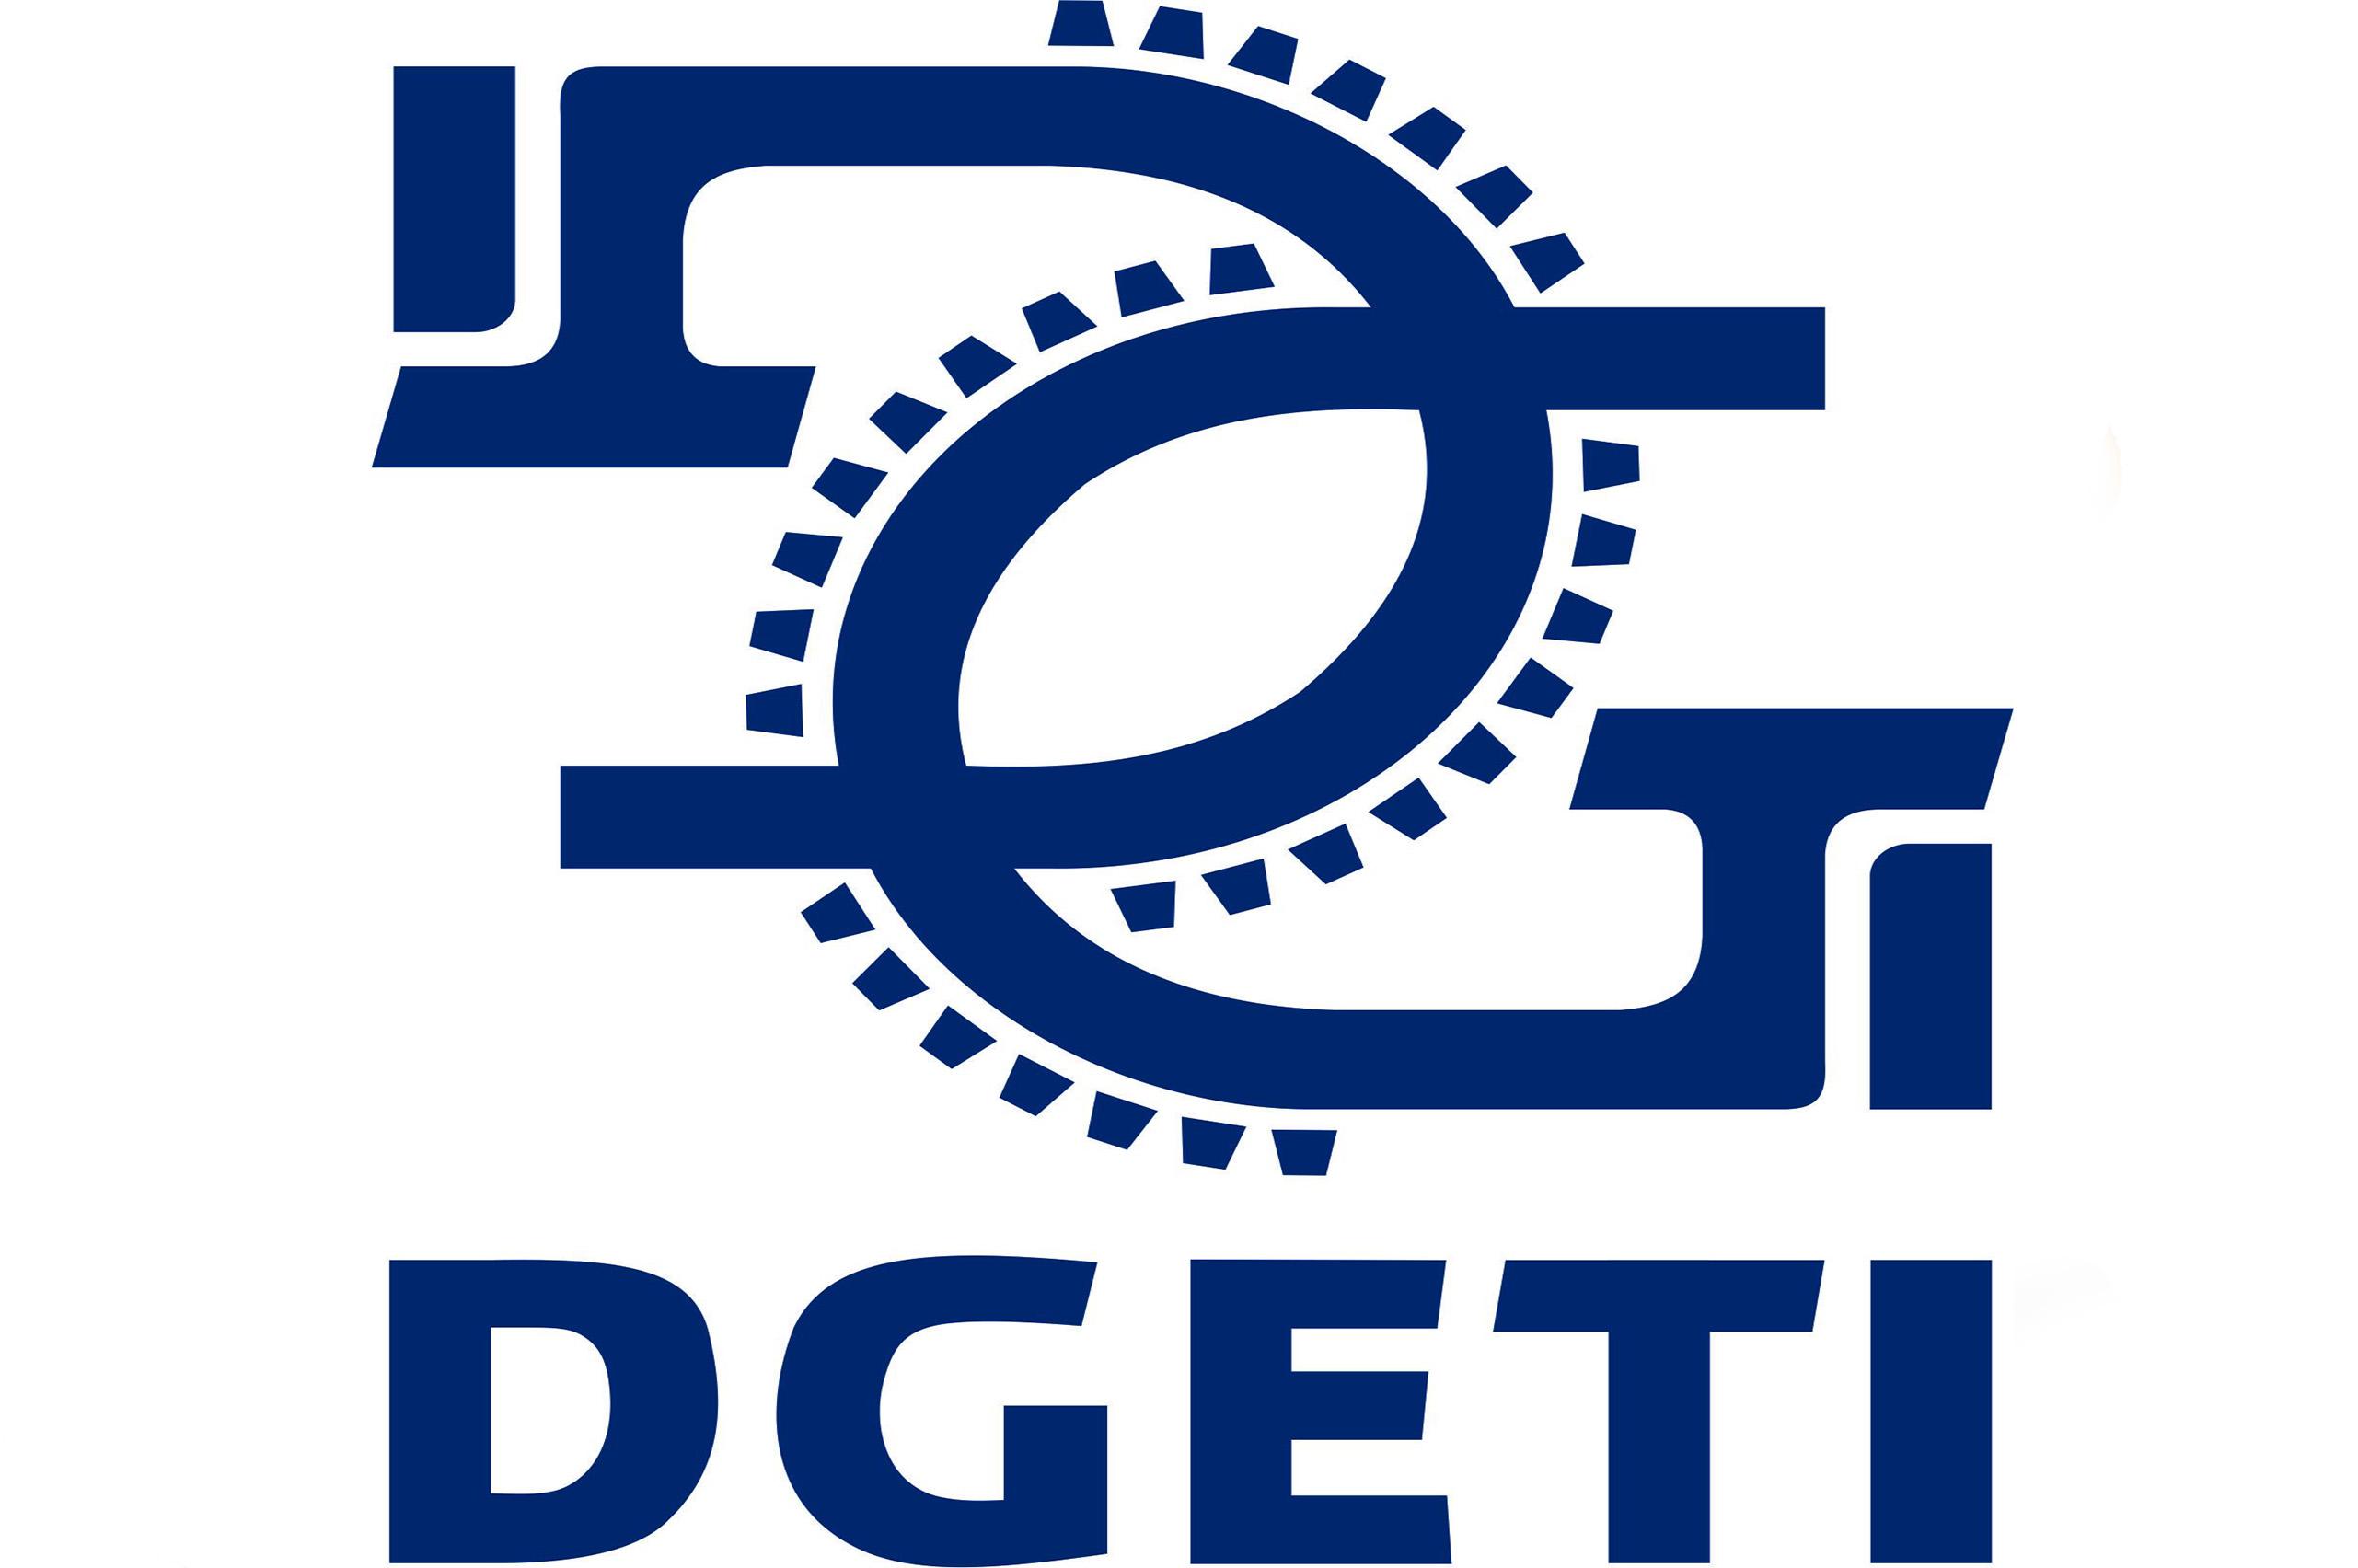 Logo Del Cbtis Logo Del Cbtis Carreras Gt